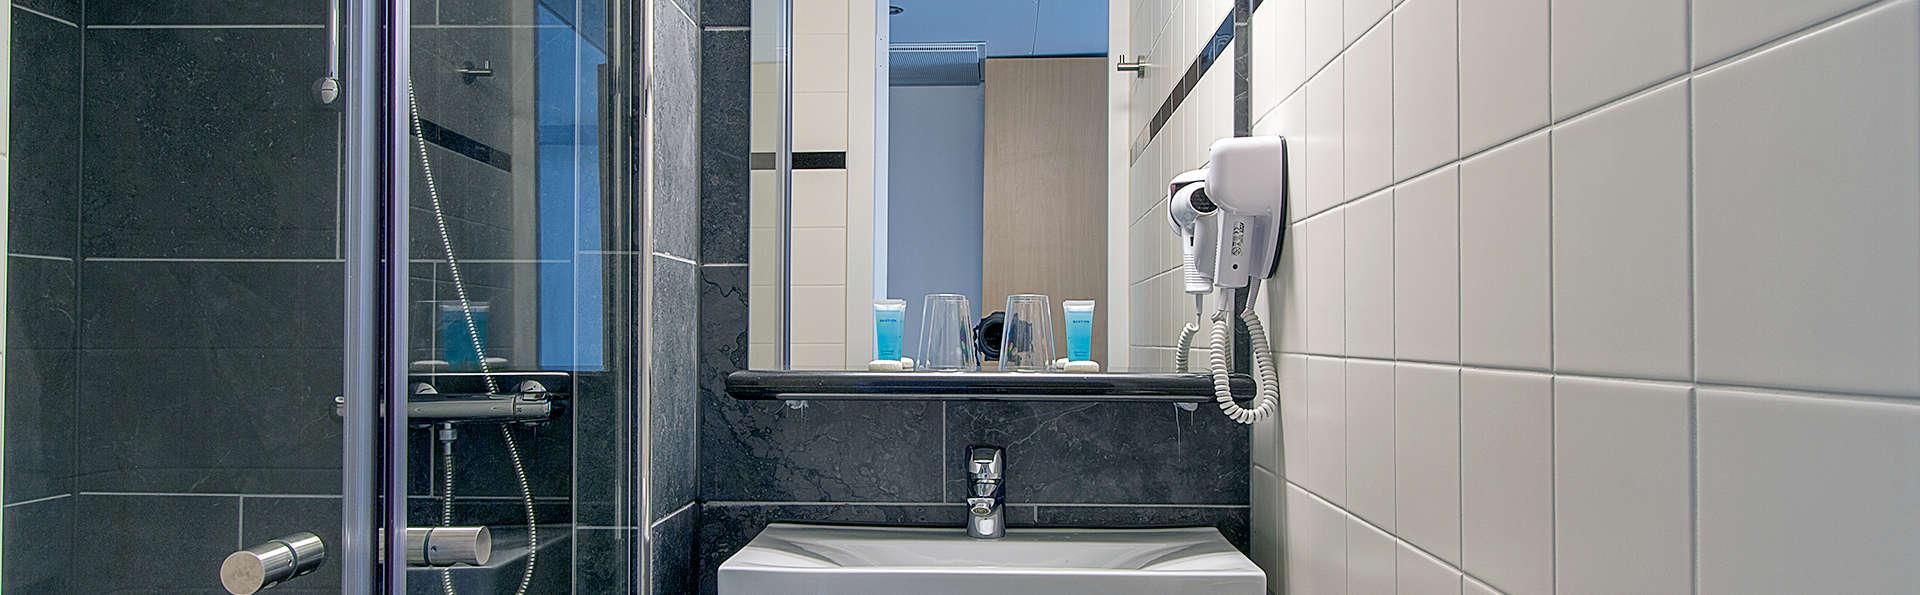 Bastion Hotel Roosendaal - Edit_Bathroom2.jpg